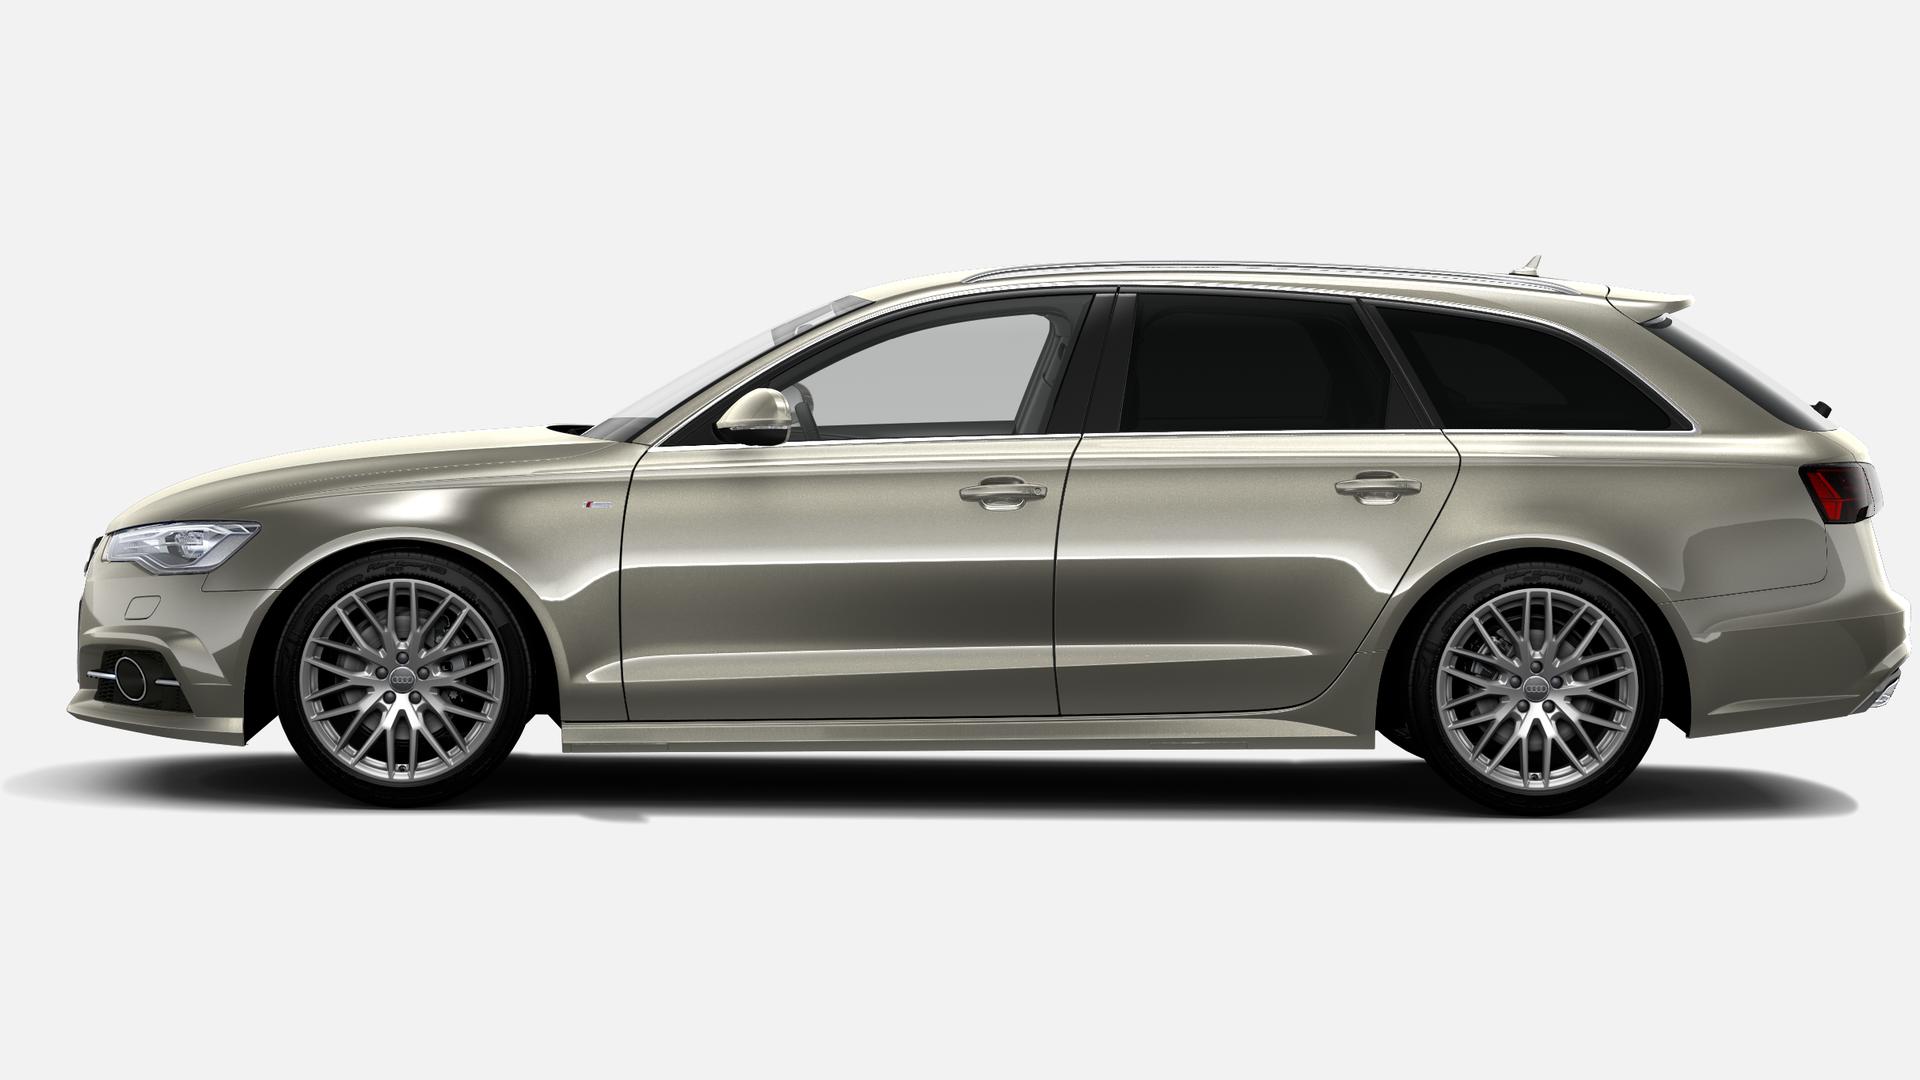 Vista Lateral izquierda de Audi A6 Avant 2.0 TDI S Line Edition quattro S Tronic 140 kW (190 CV)